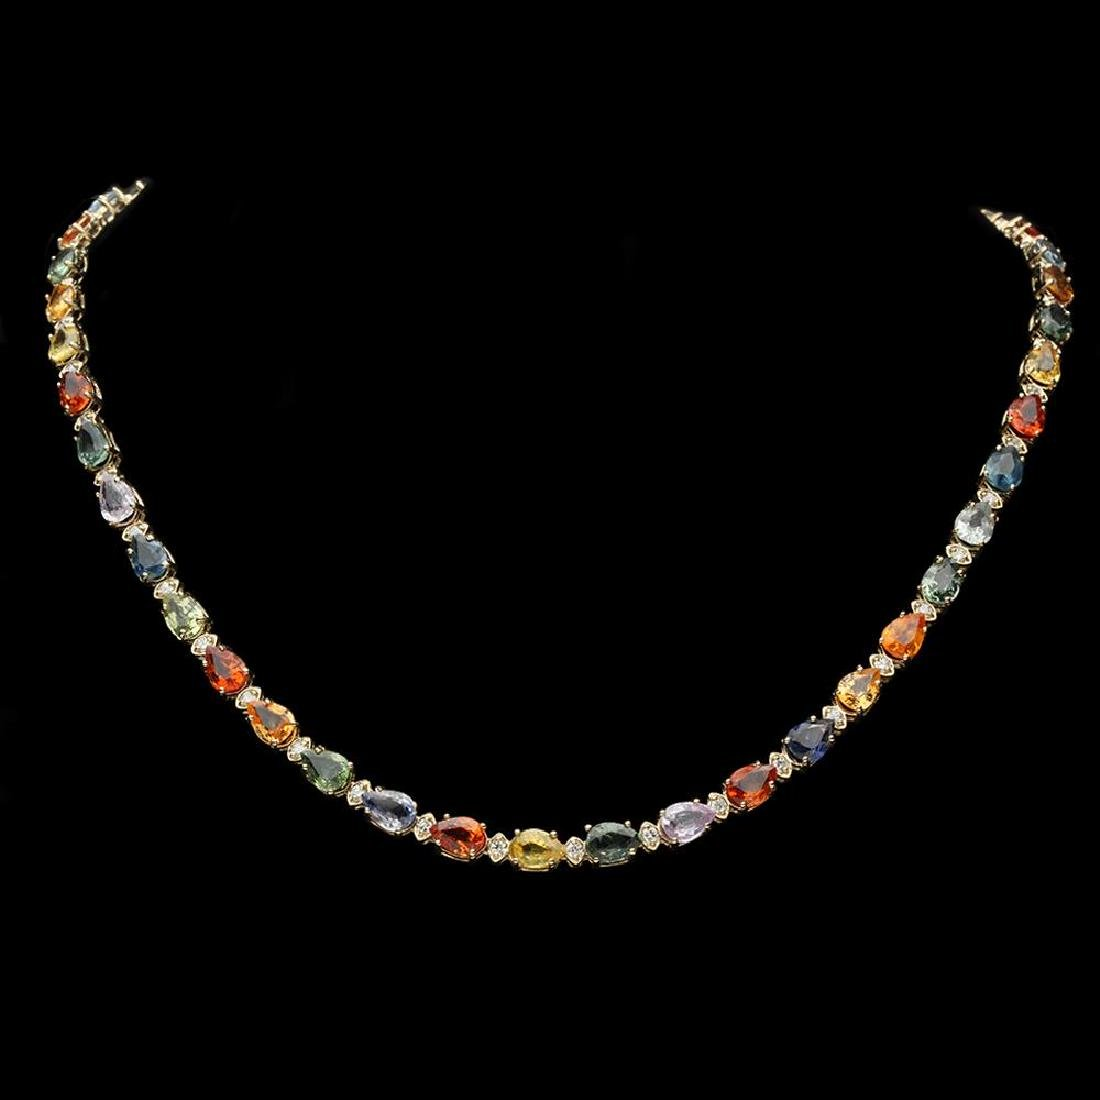 14K Gold 36.89ct Sapphire 1.51ct Diamond Necklace